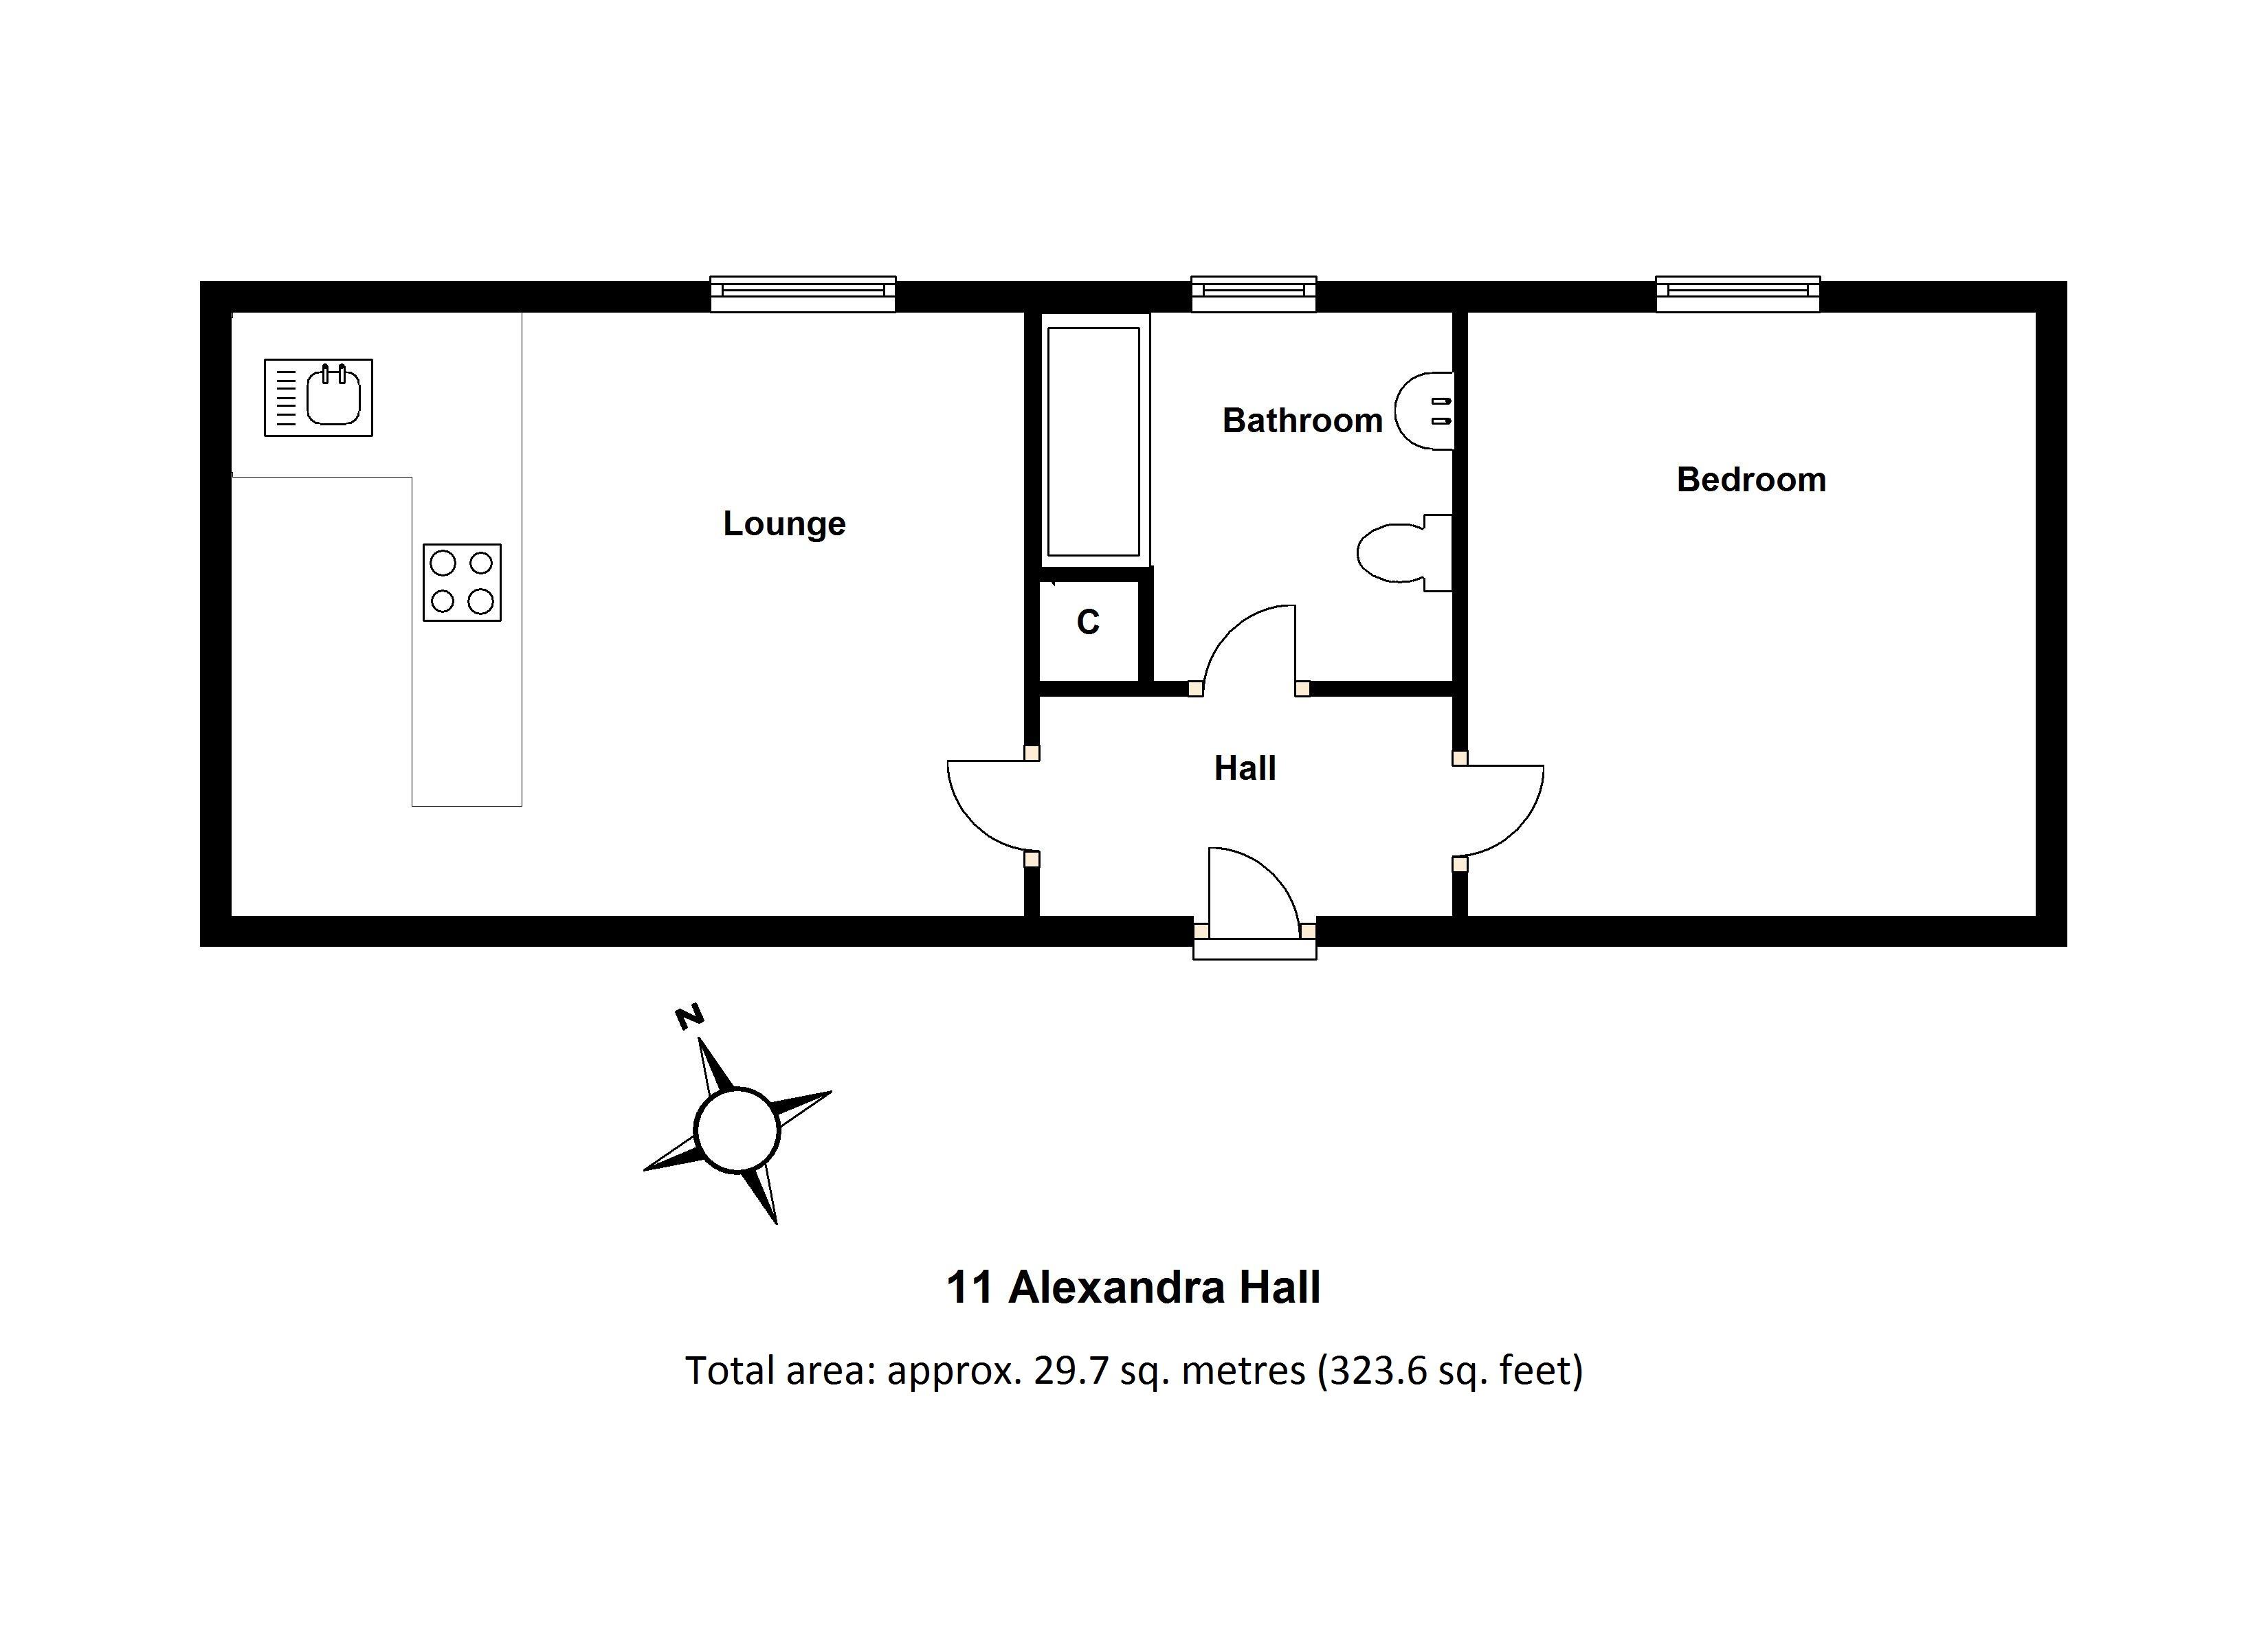 11 Alexander Hall Floorplan